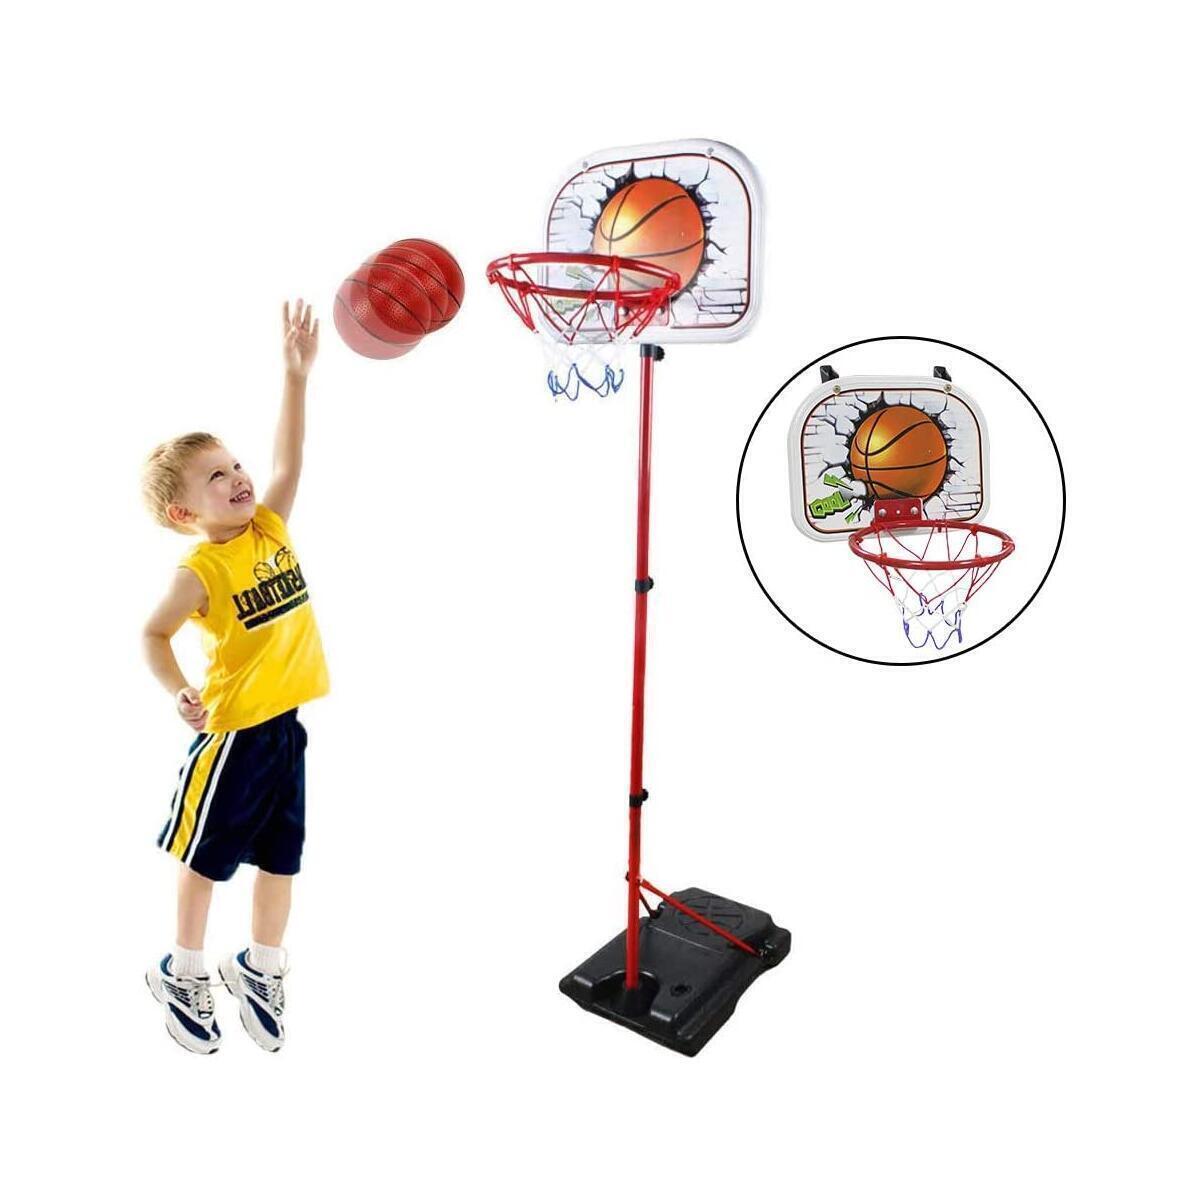 HANMUN Basketball Hoop for Kids Set Adjustable Portable Basketball Set 2-in-1 2020 TOP19044 Kids Basketball Stand Sport Game Play Set Net , Ball and air Pump Inclued 3+ Years Toddler Baby Sport